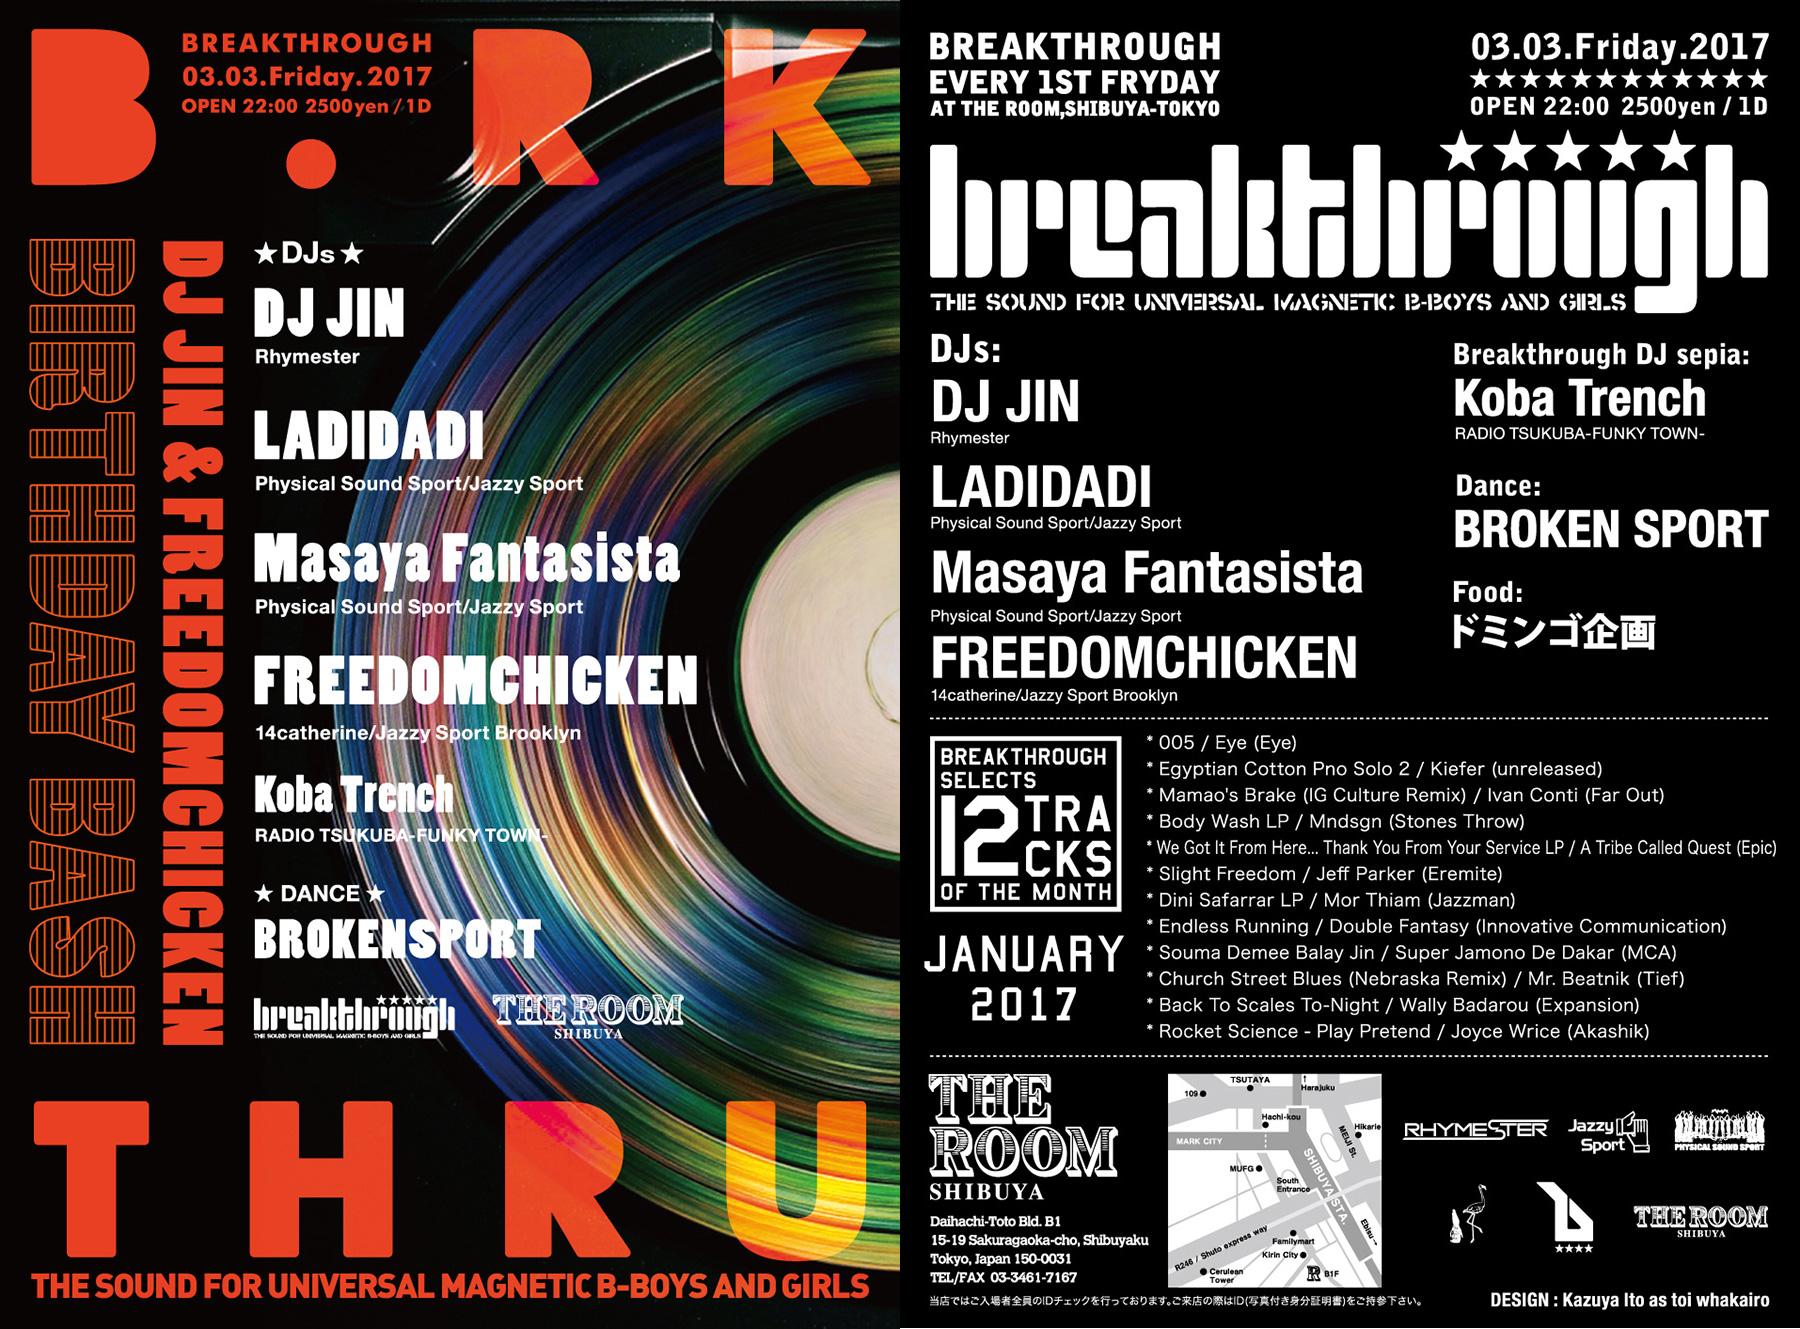 Breakthrough-17.03.03_all_final